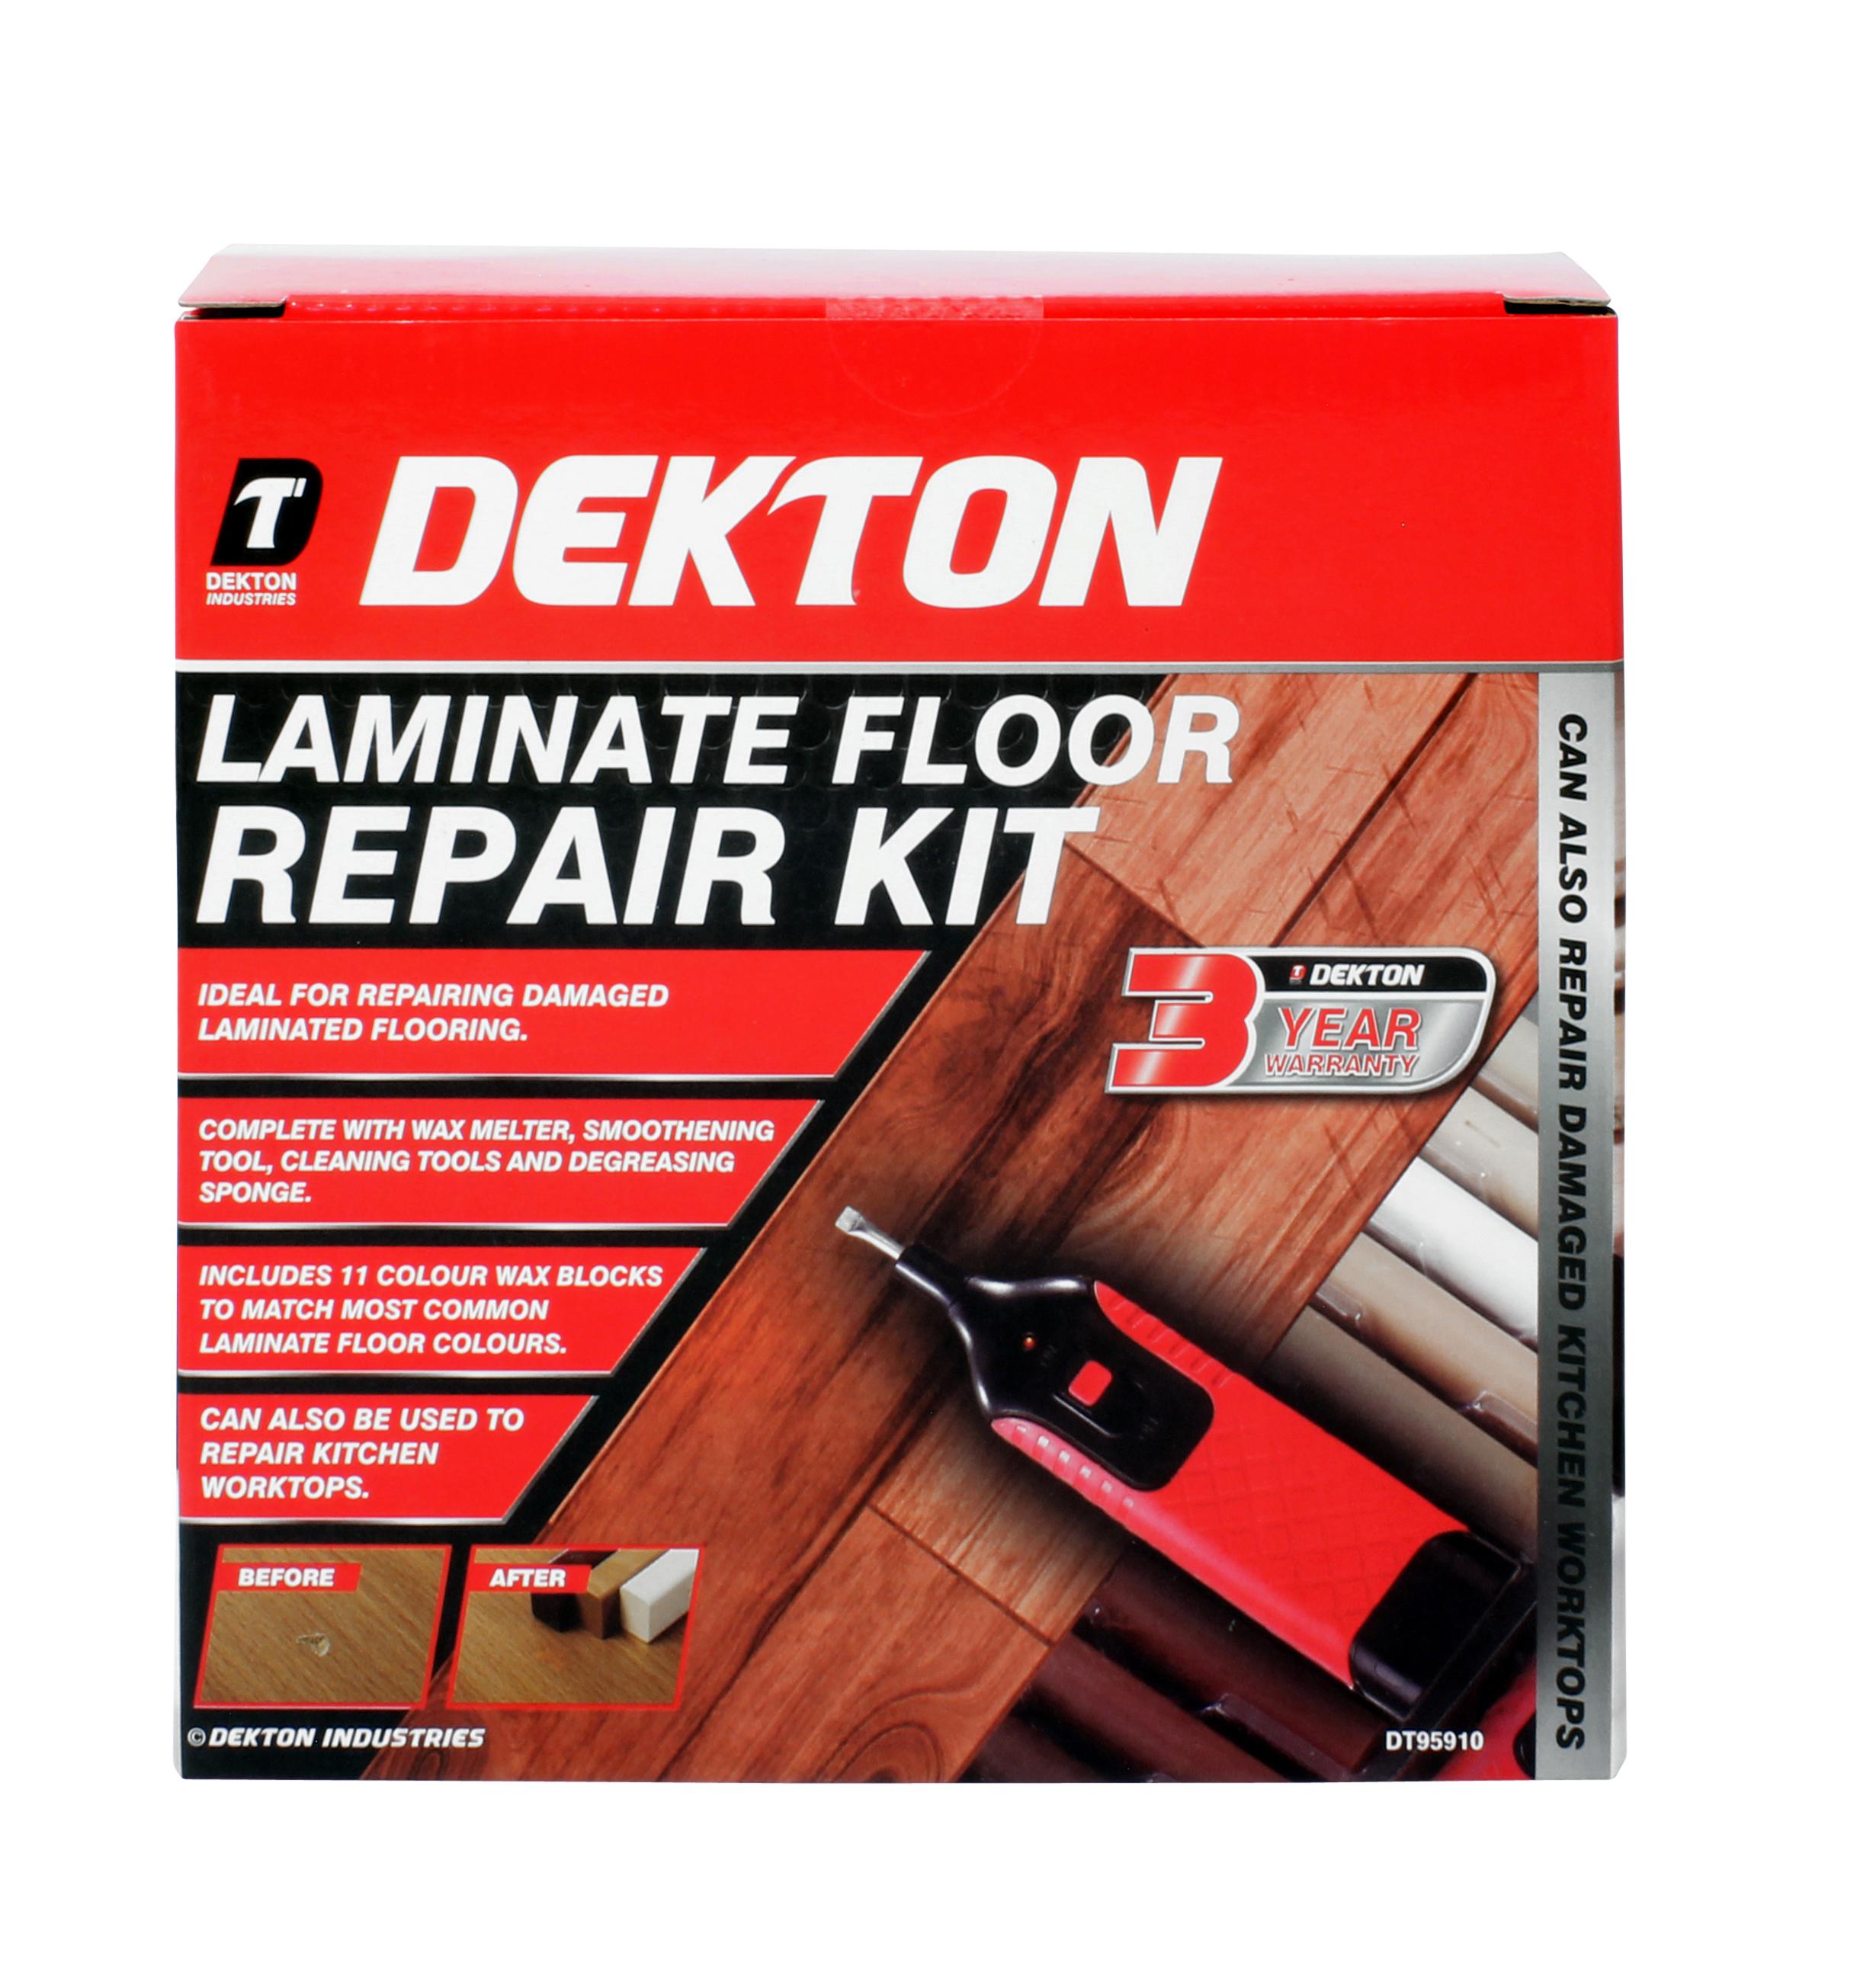 Dekton Laminate Floor Repair Kit